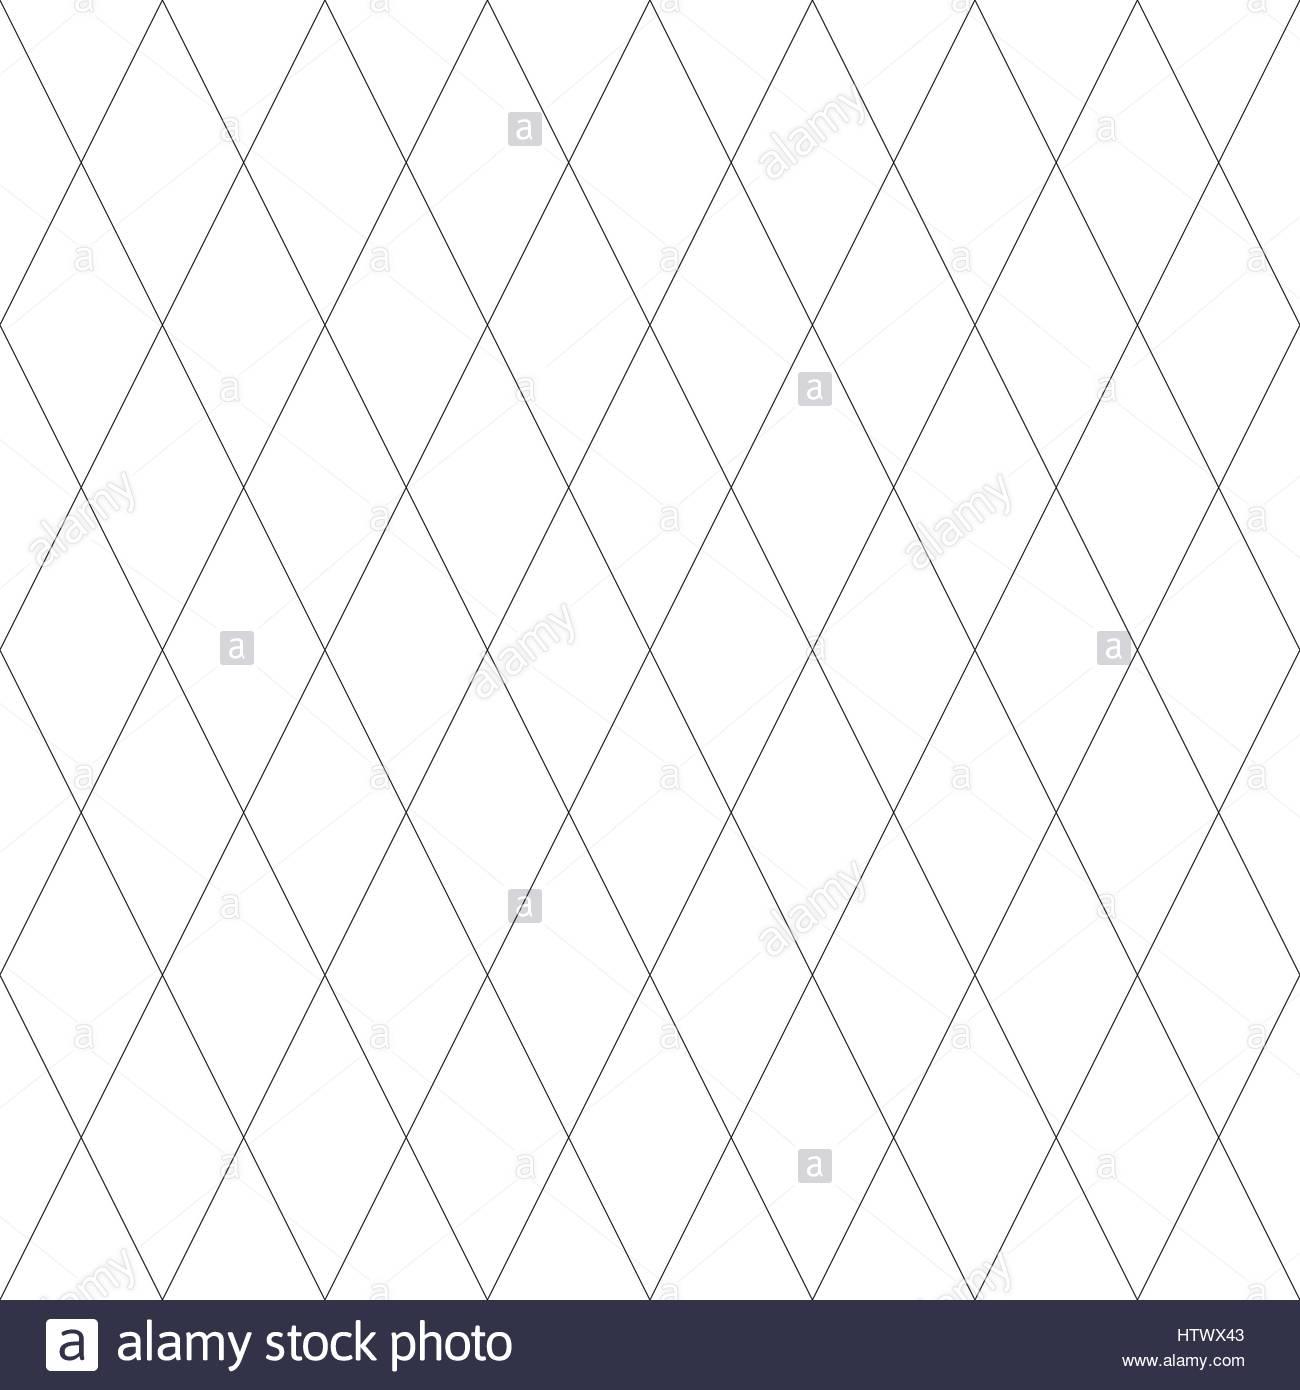 Fishnet Pattern Awesome Design